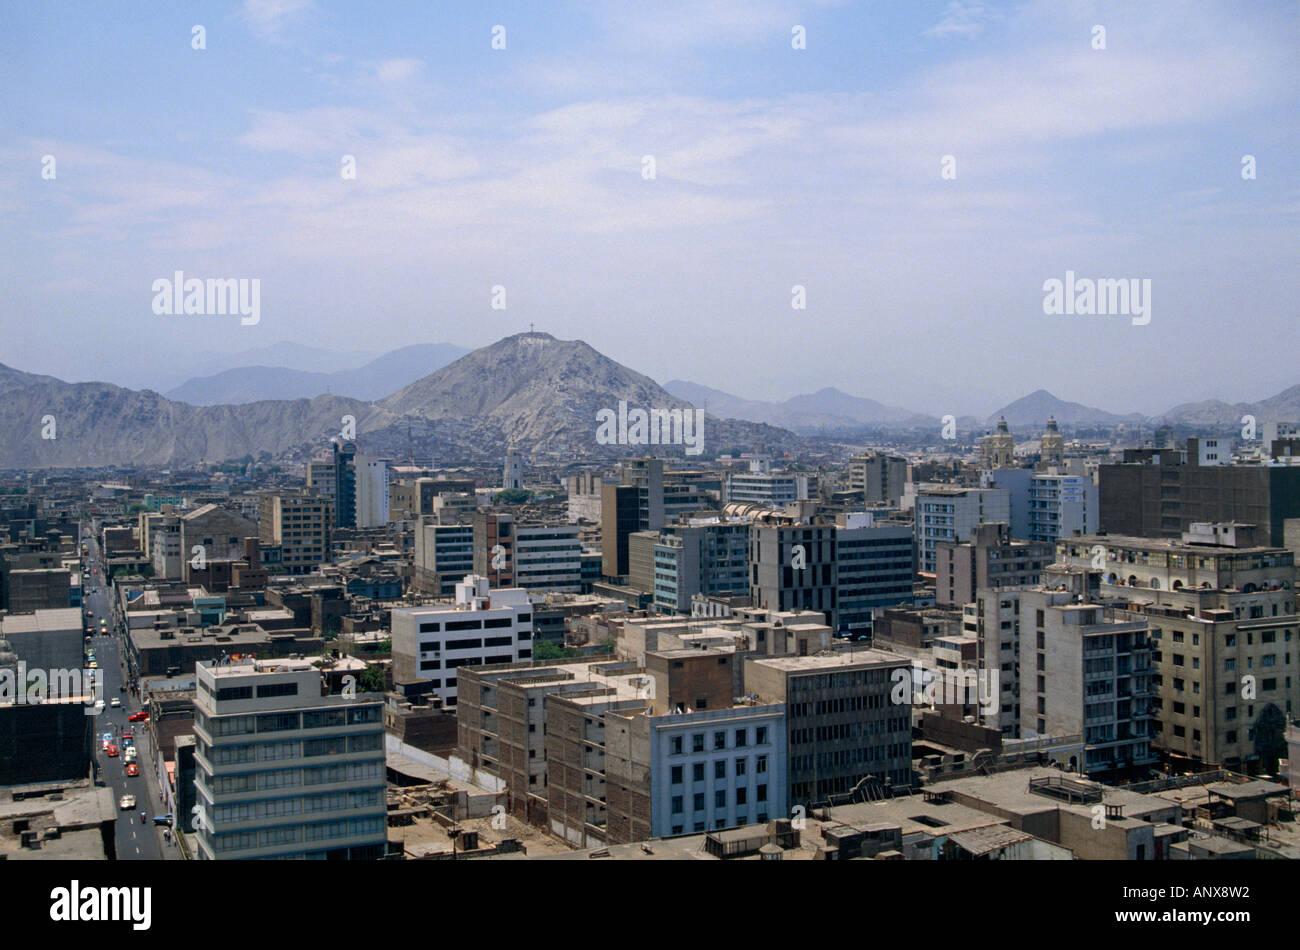 city of lima suburb peru - Stock Image